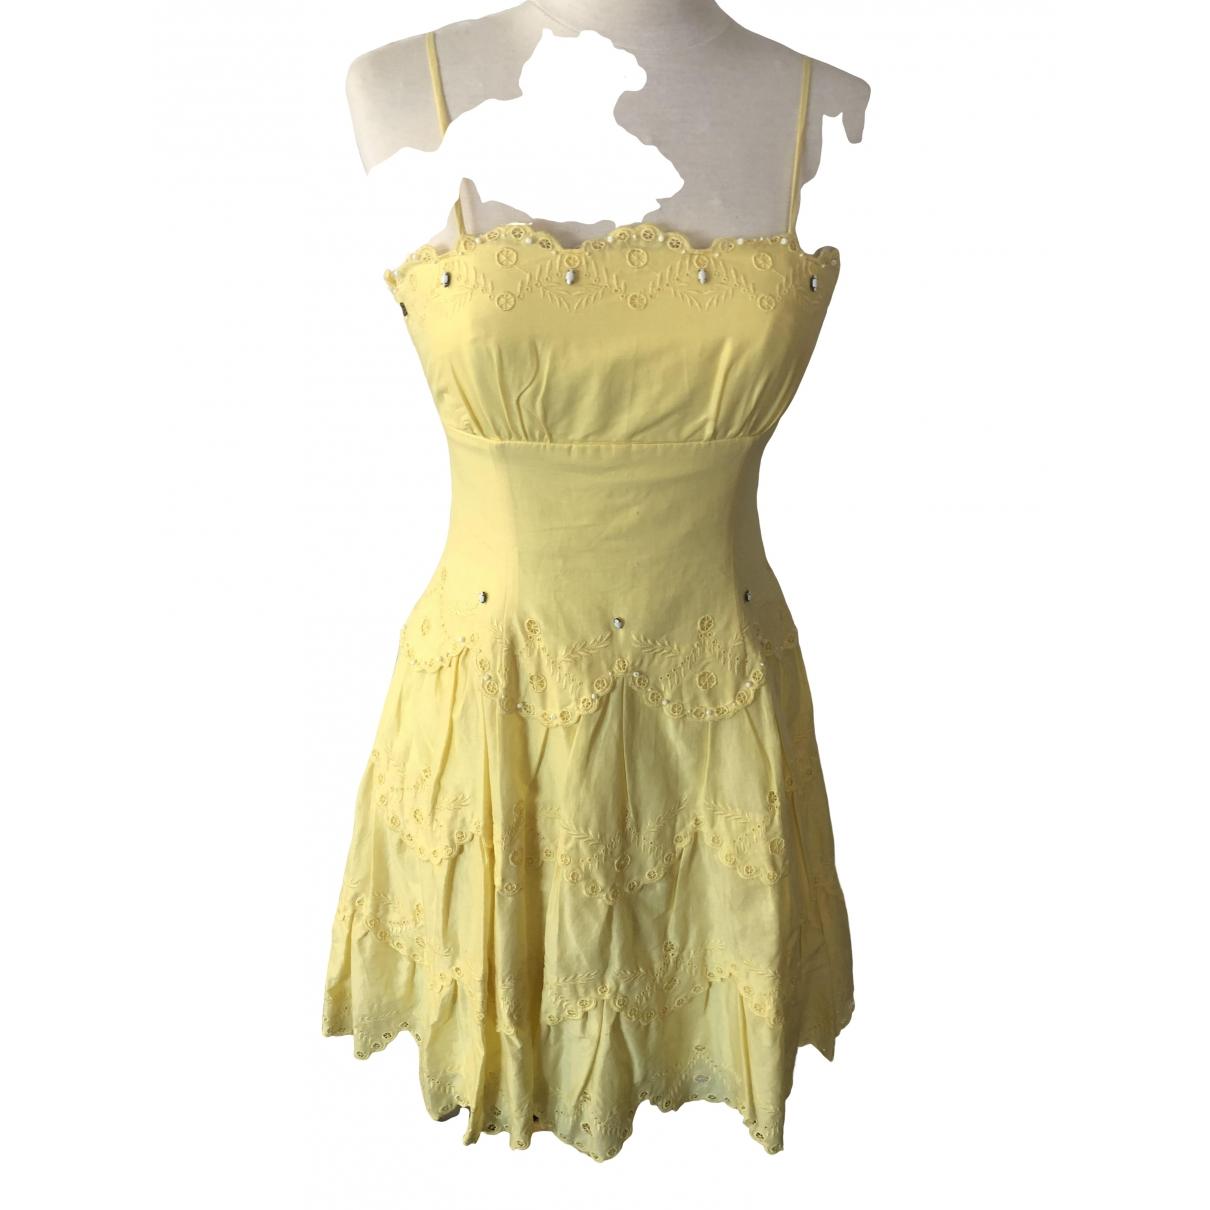 Bcbg Max Azria \N Yellow Cotton dress for Women 4 0-5